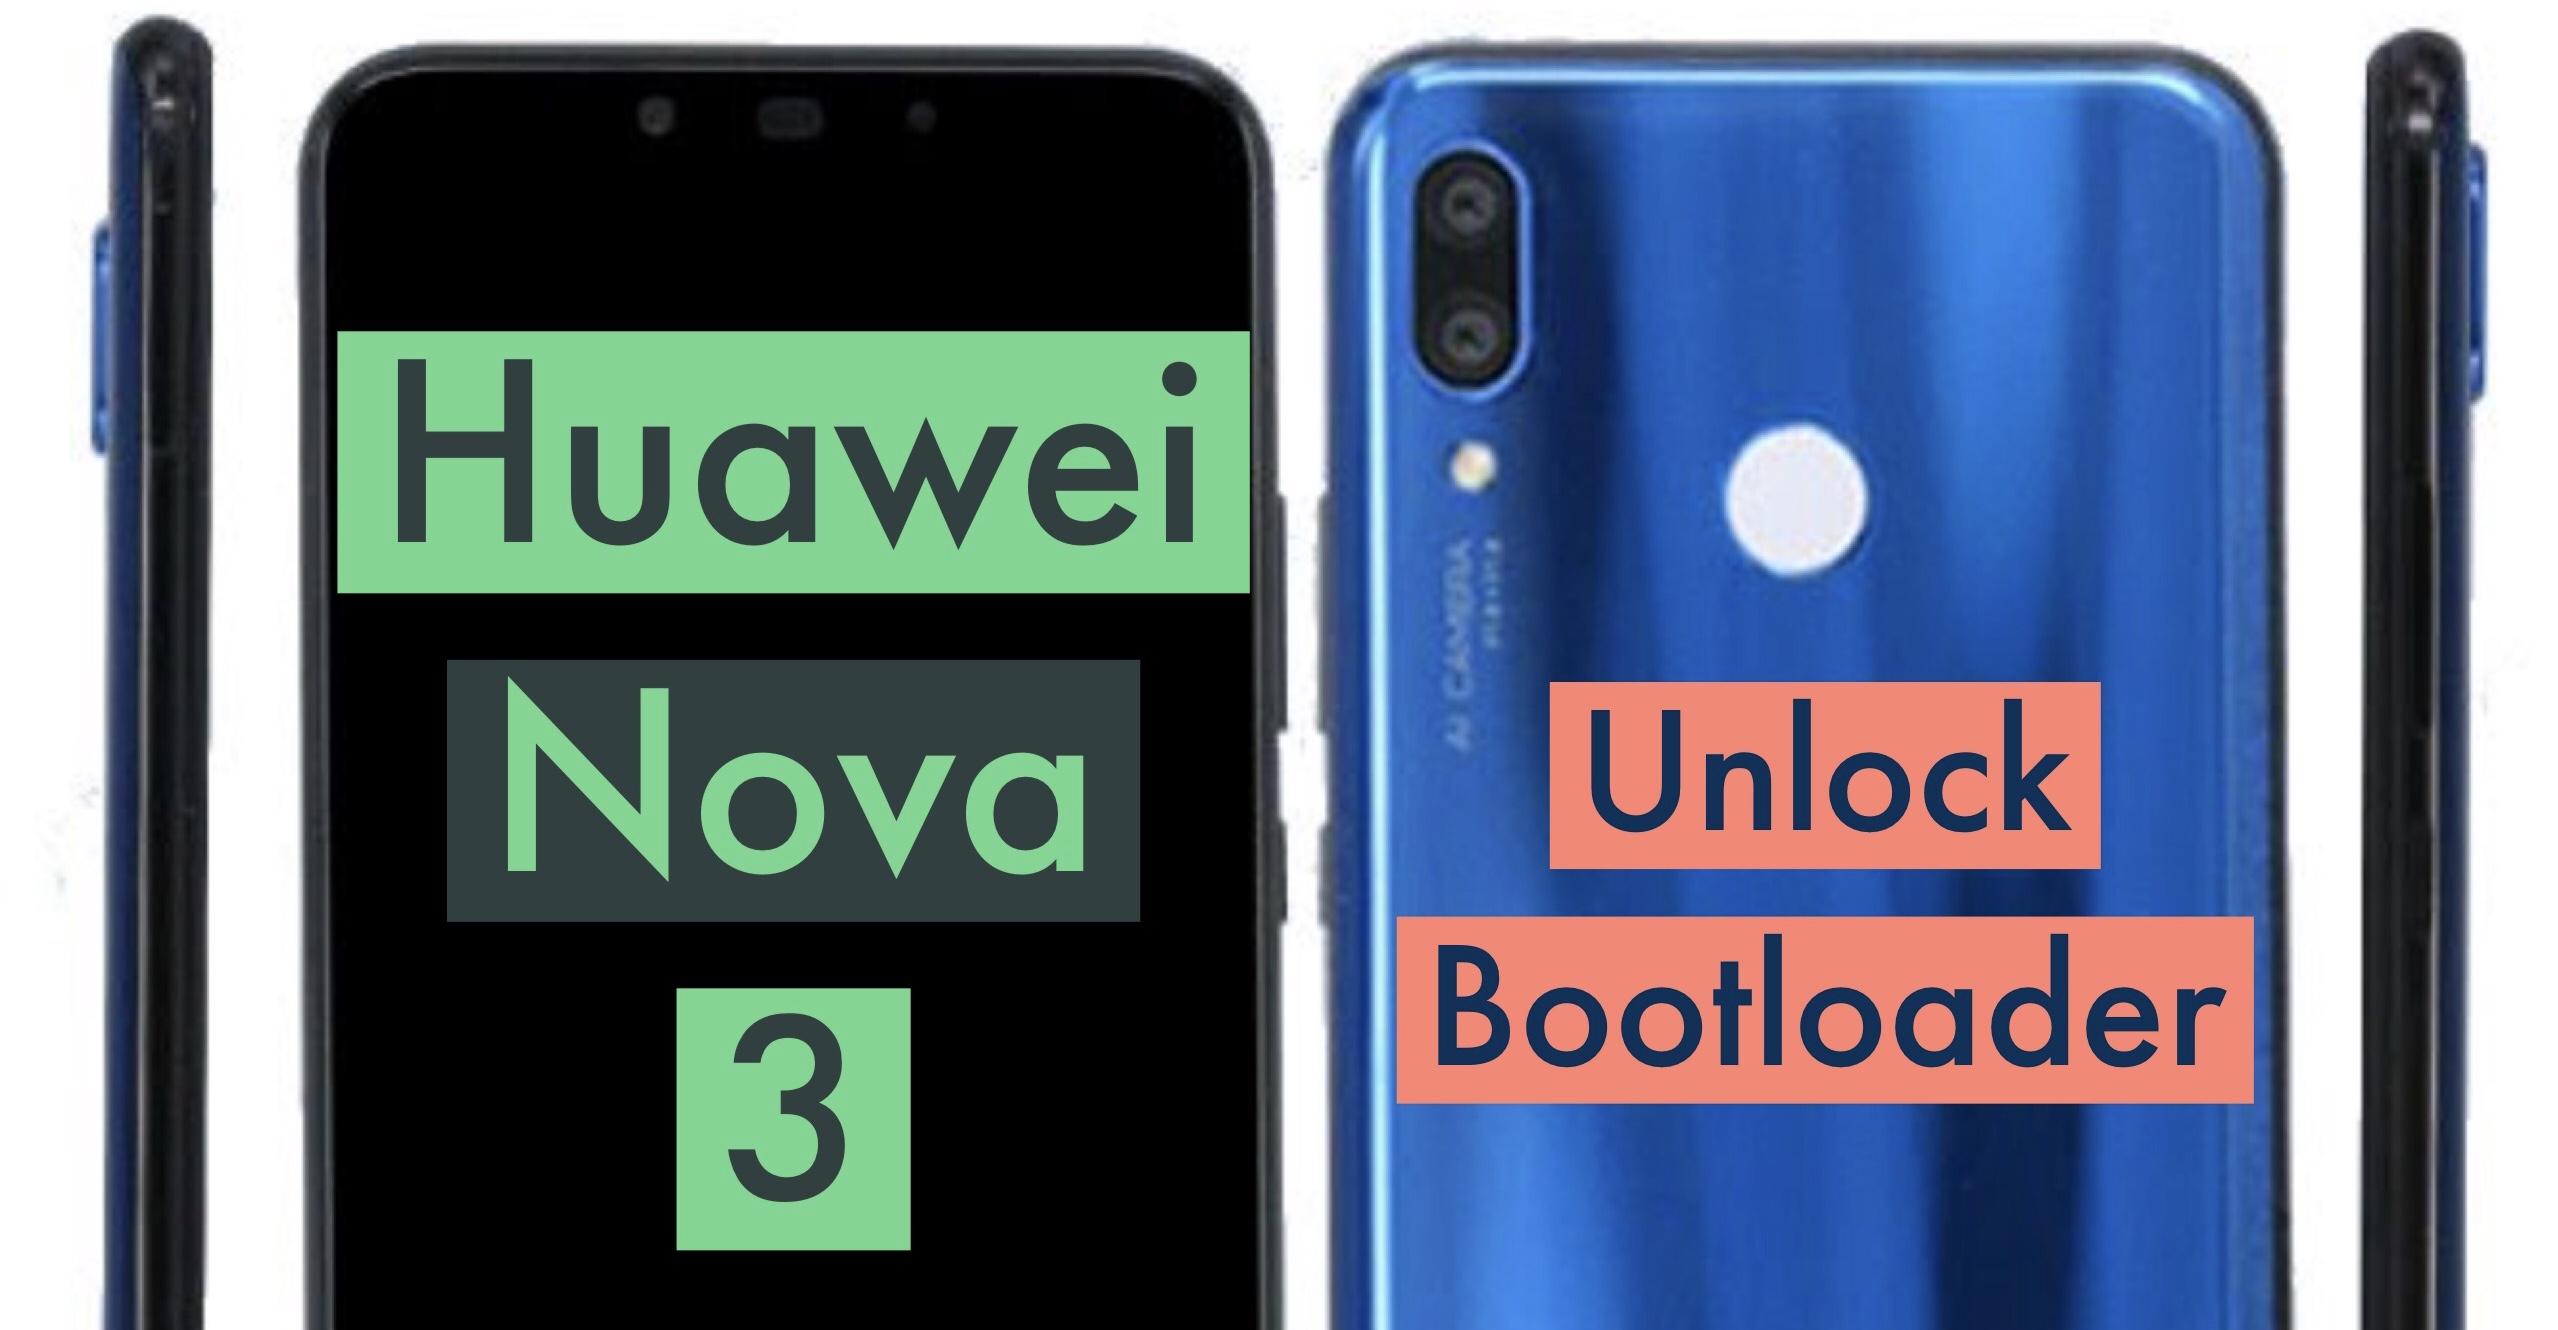 How to Unlock Bootloader on Huawei Nova 3? UNLOCK CODE!